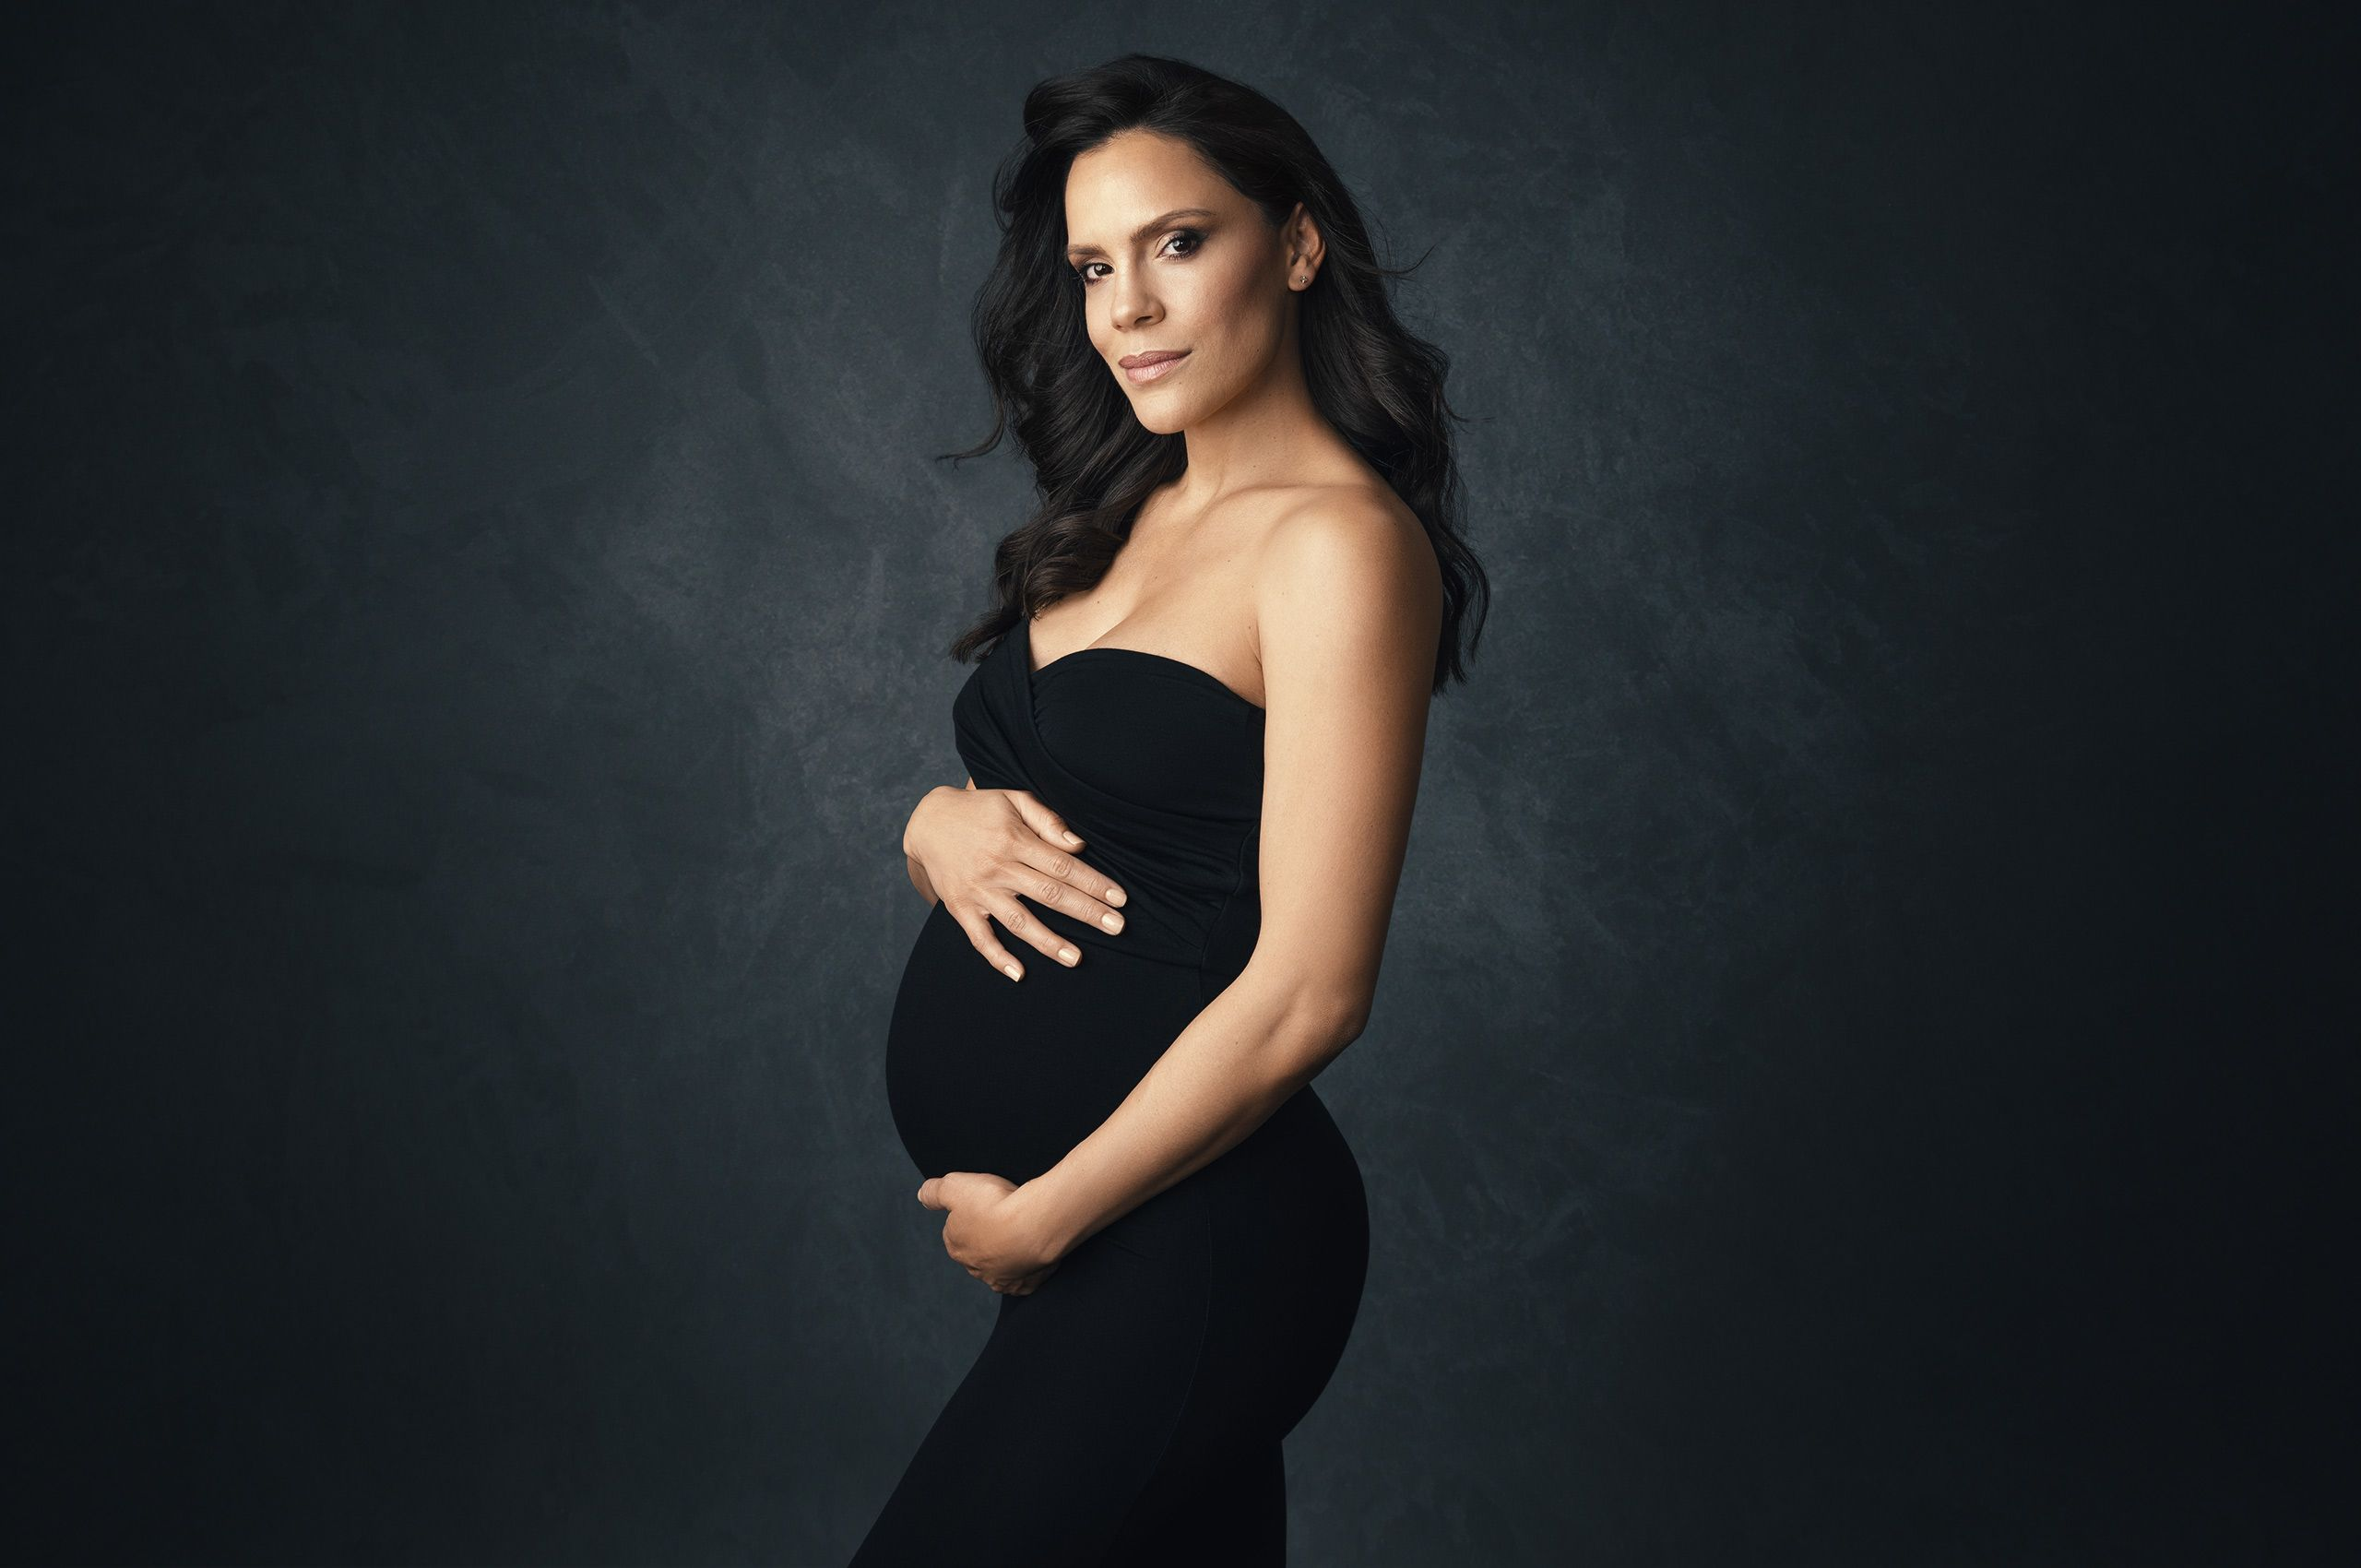 Lizet-Pregnancy-Shoot2493.jpg